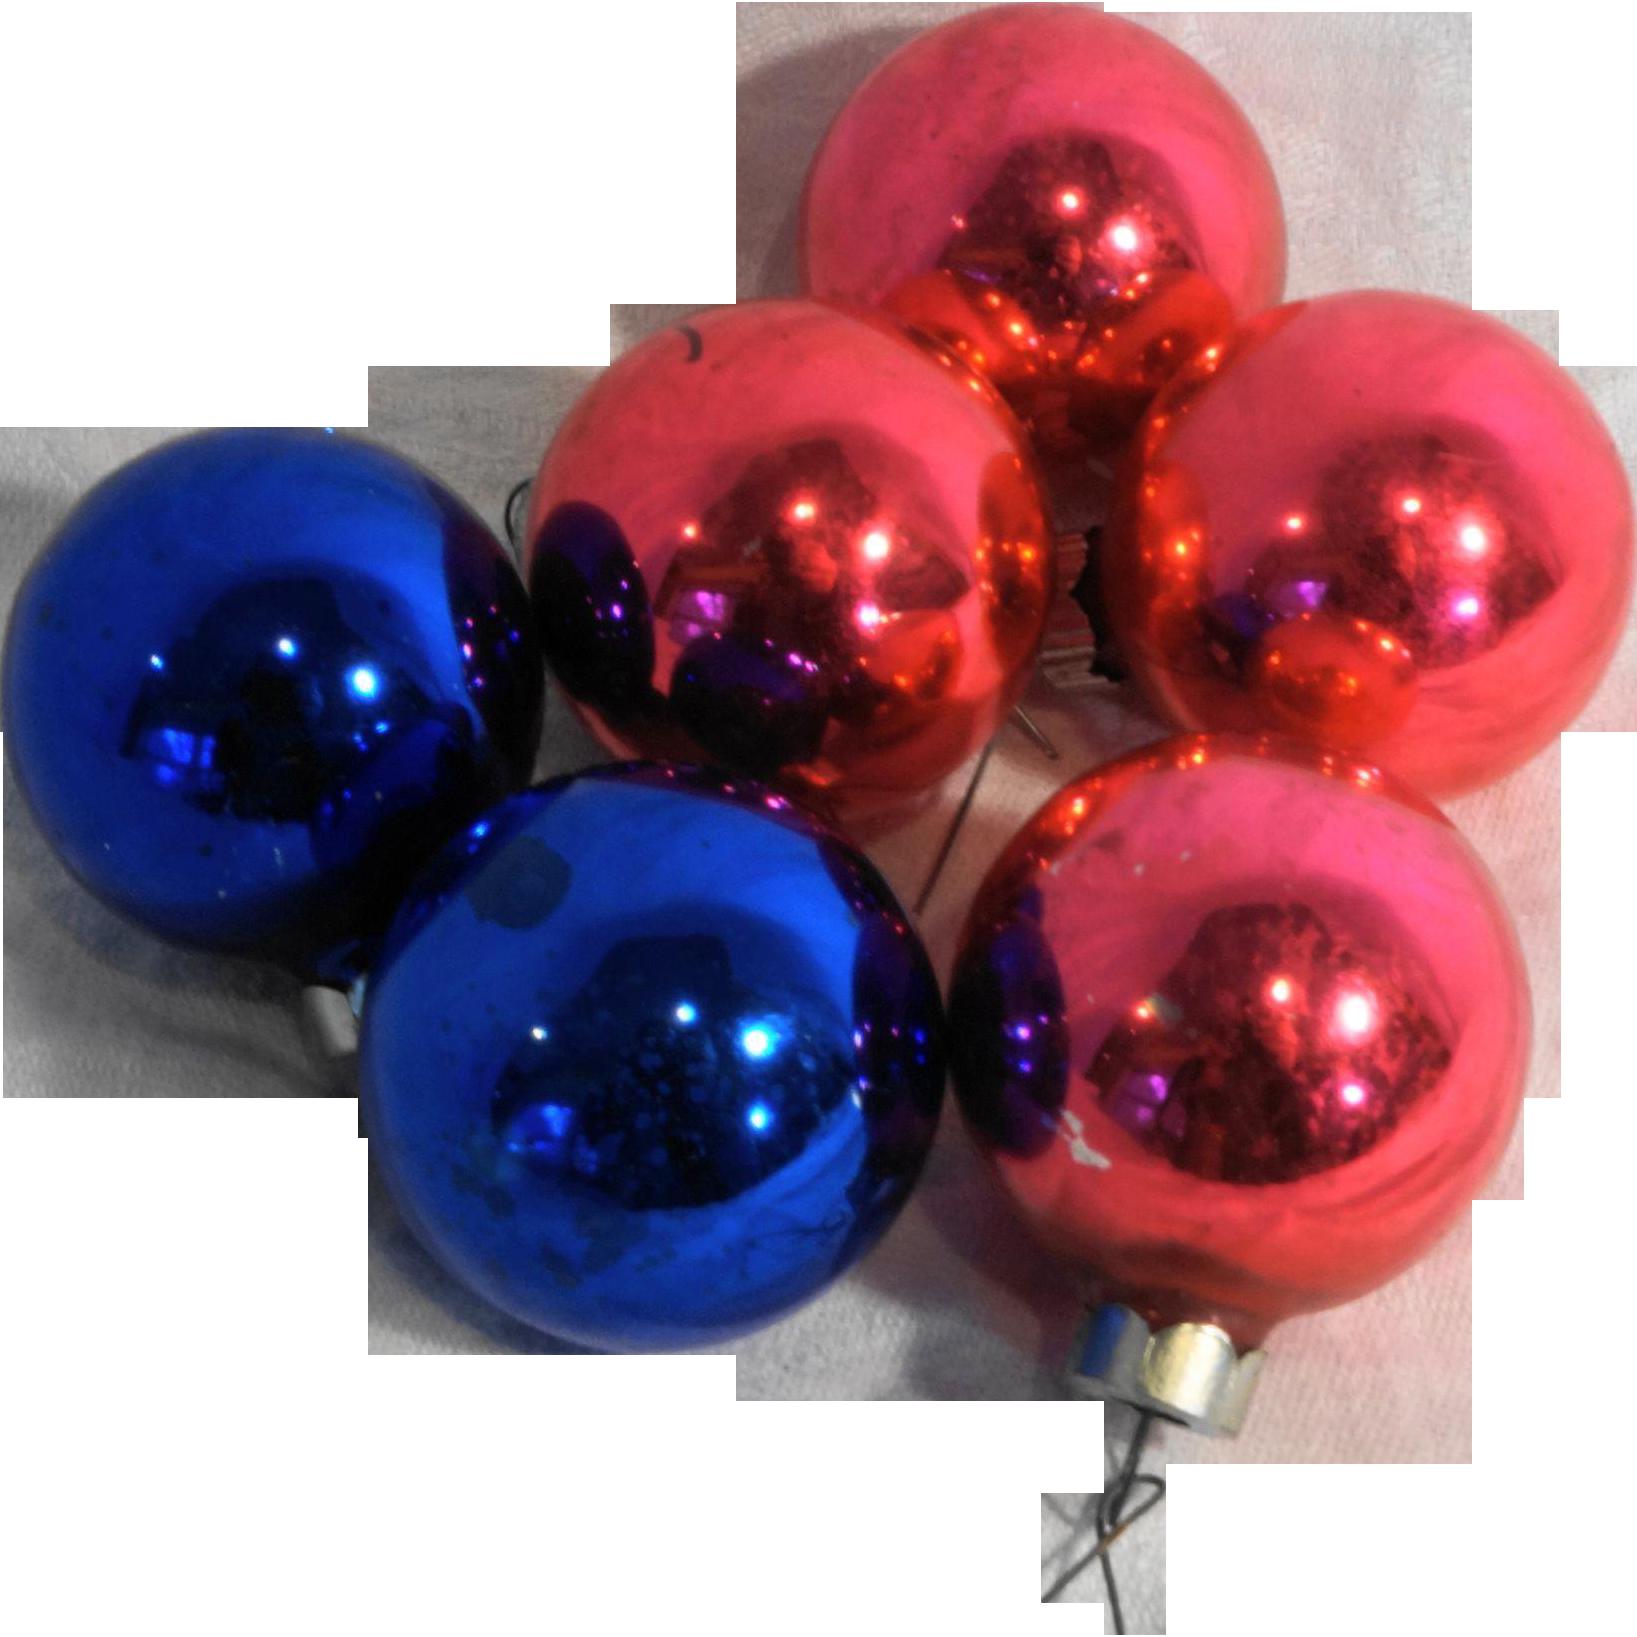 Shiny Brite Rauch Mixed Small Ball Christmas Ornaments Pink Blue